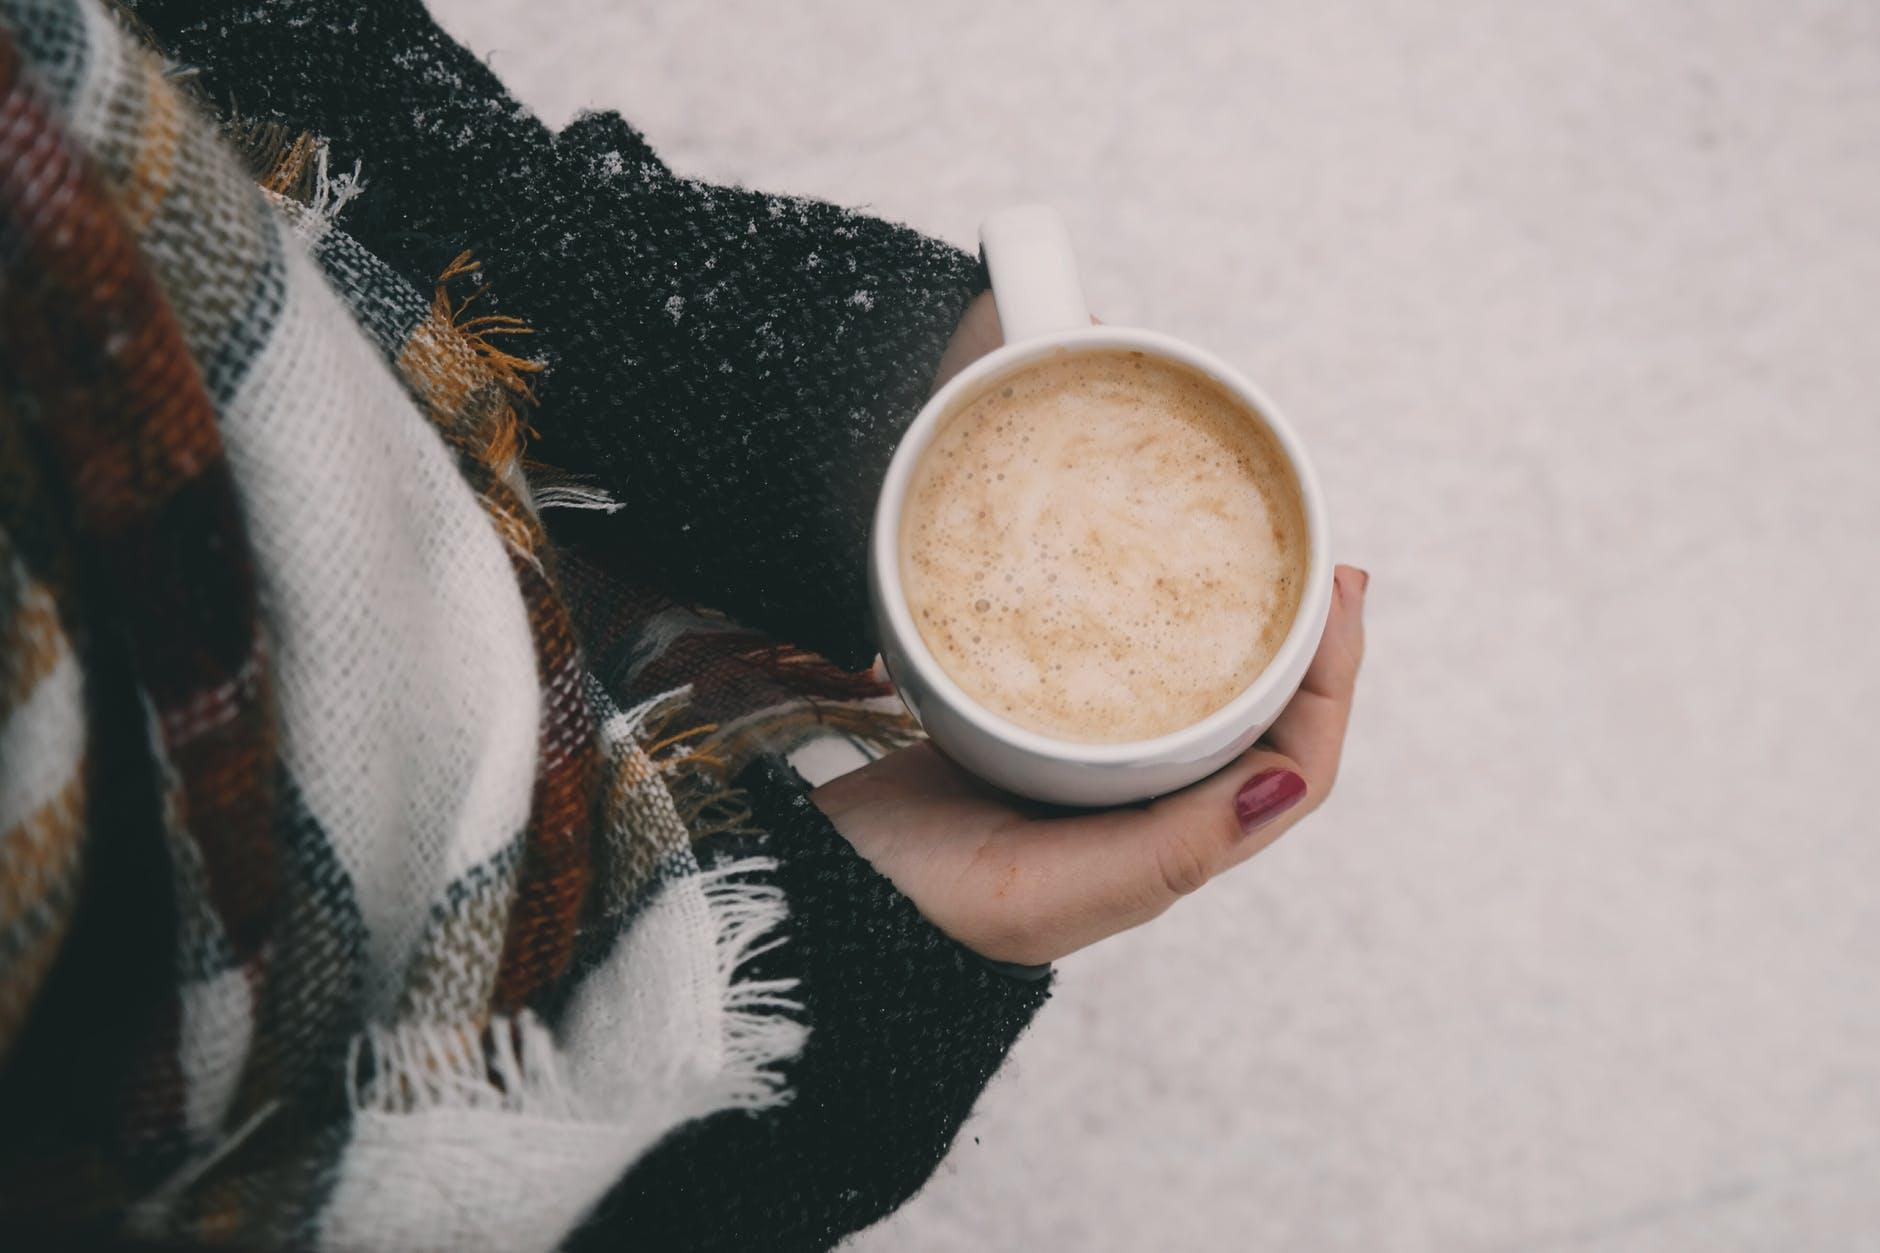 person holding mug of coffee